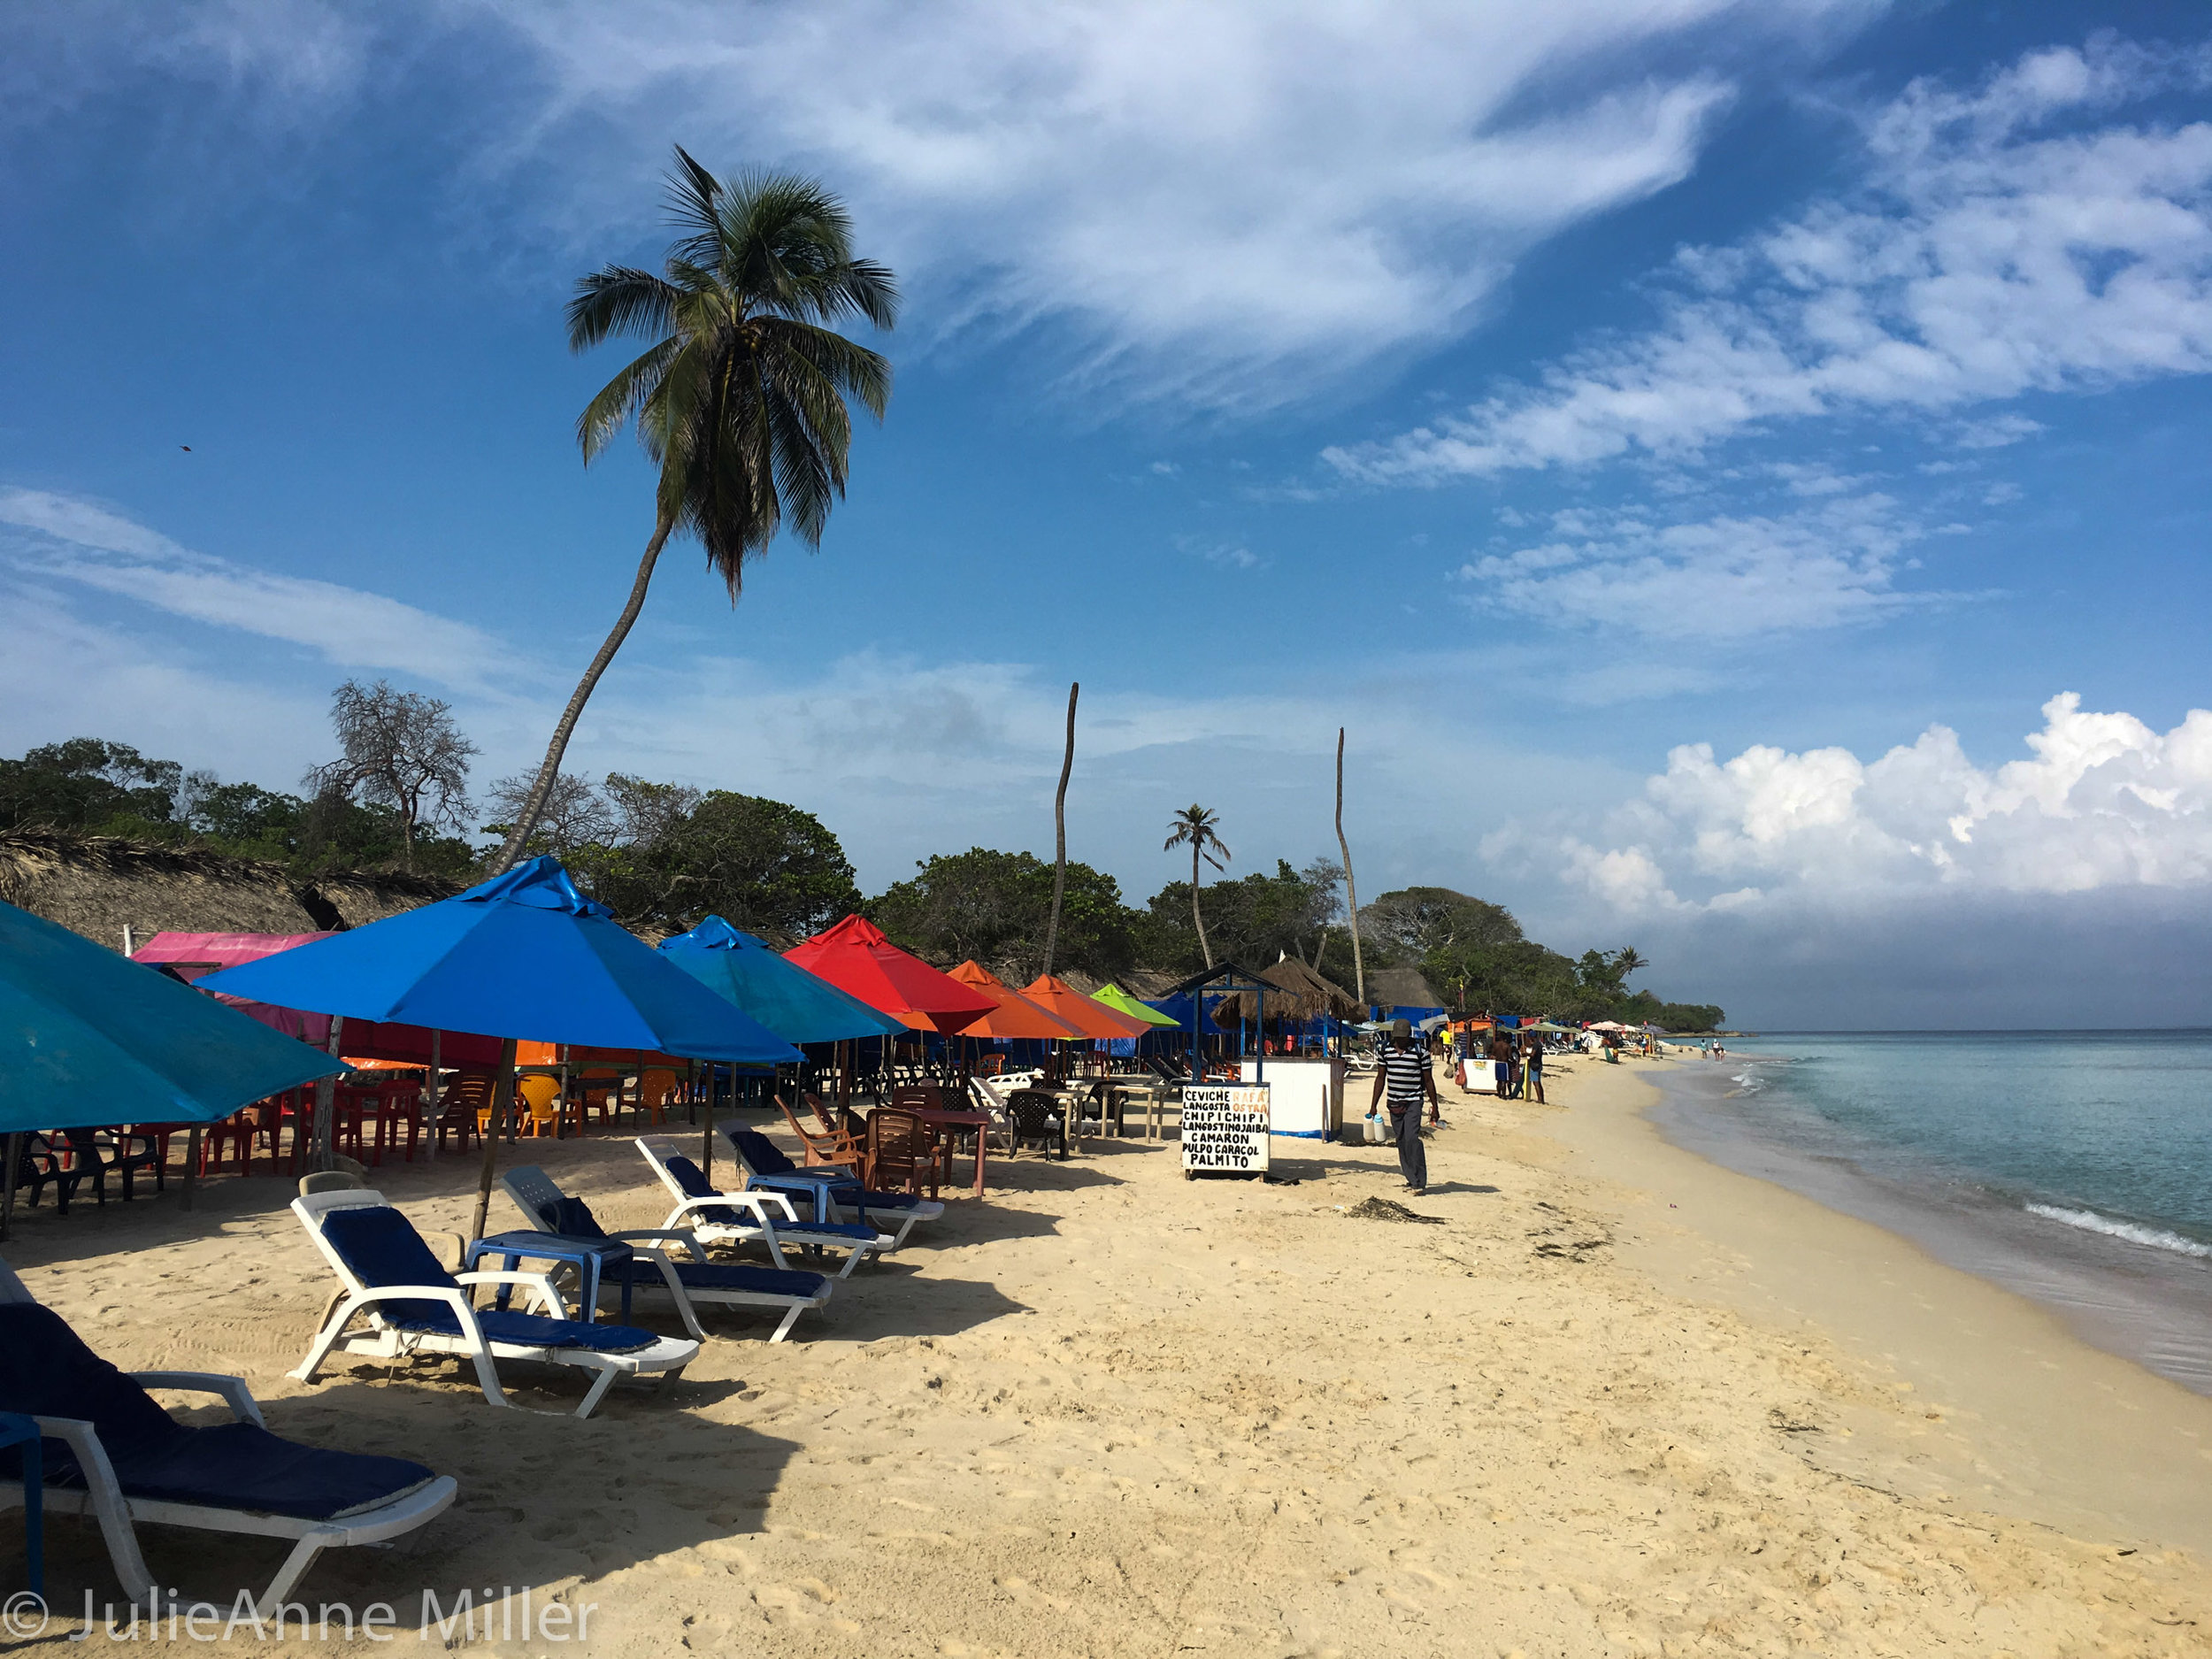 playa blanca umbrellas.jpg